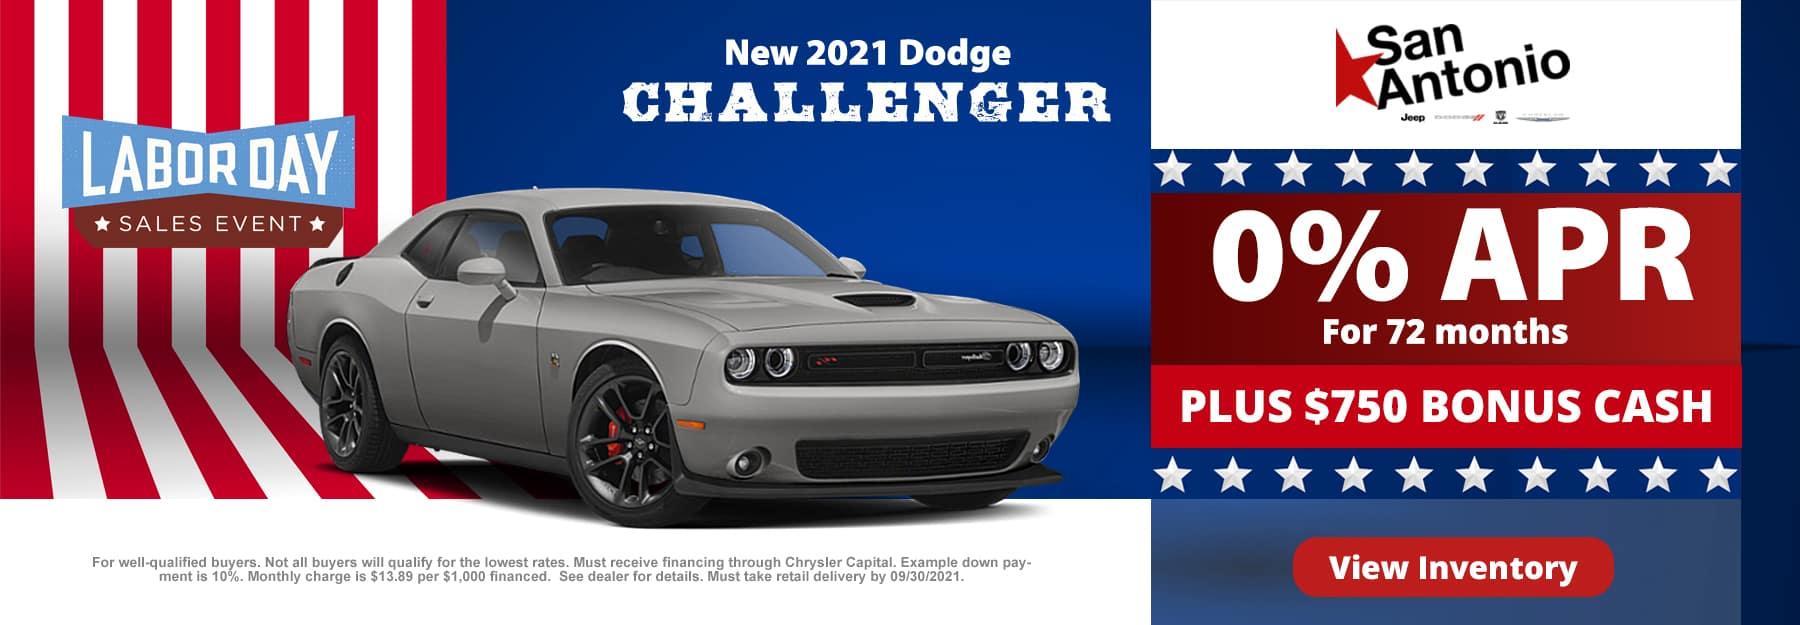 SANW10143-Challenger